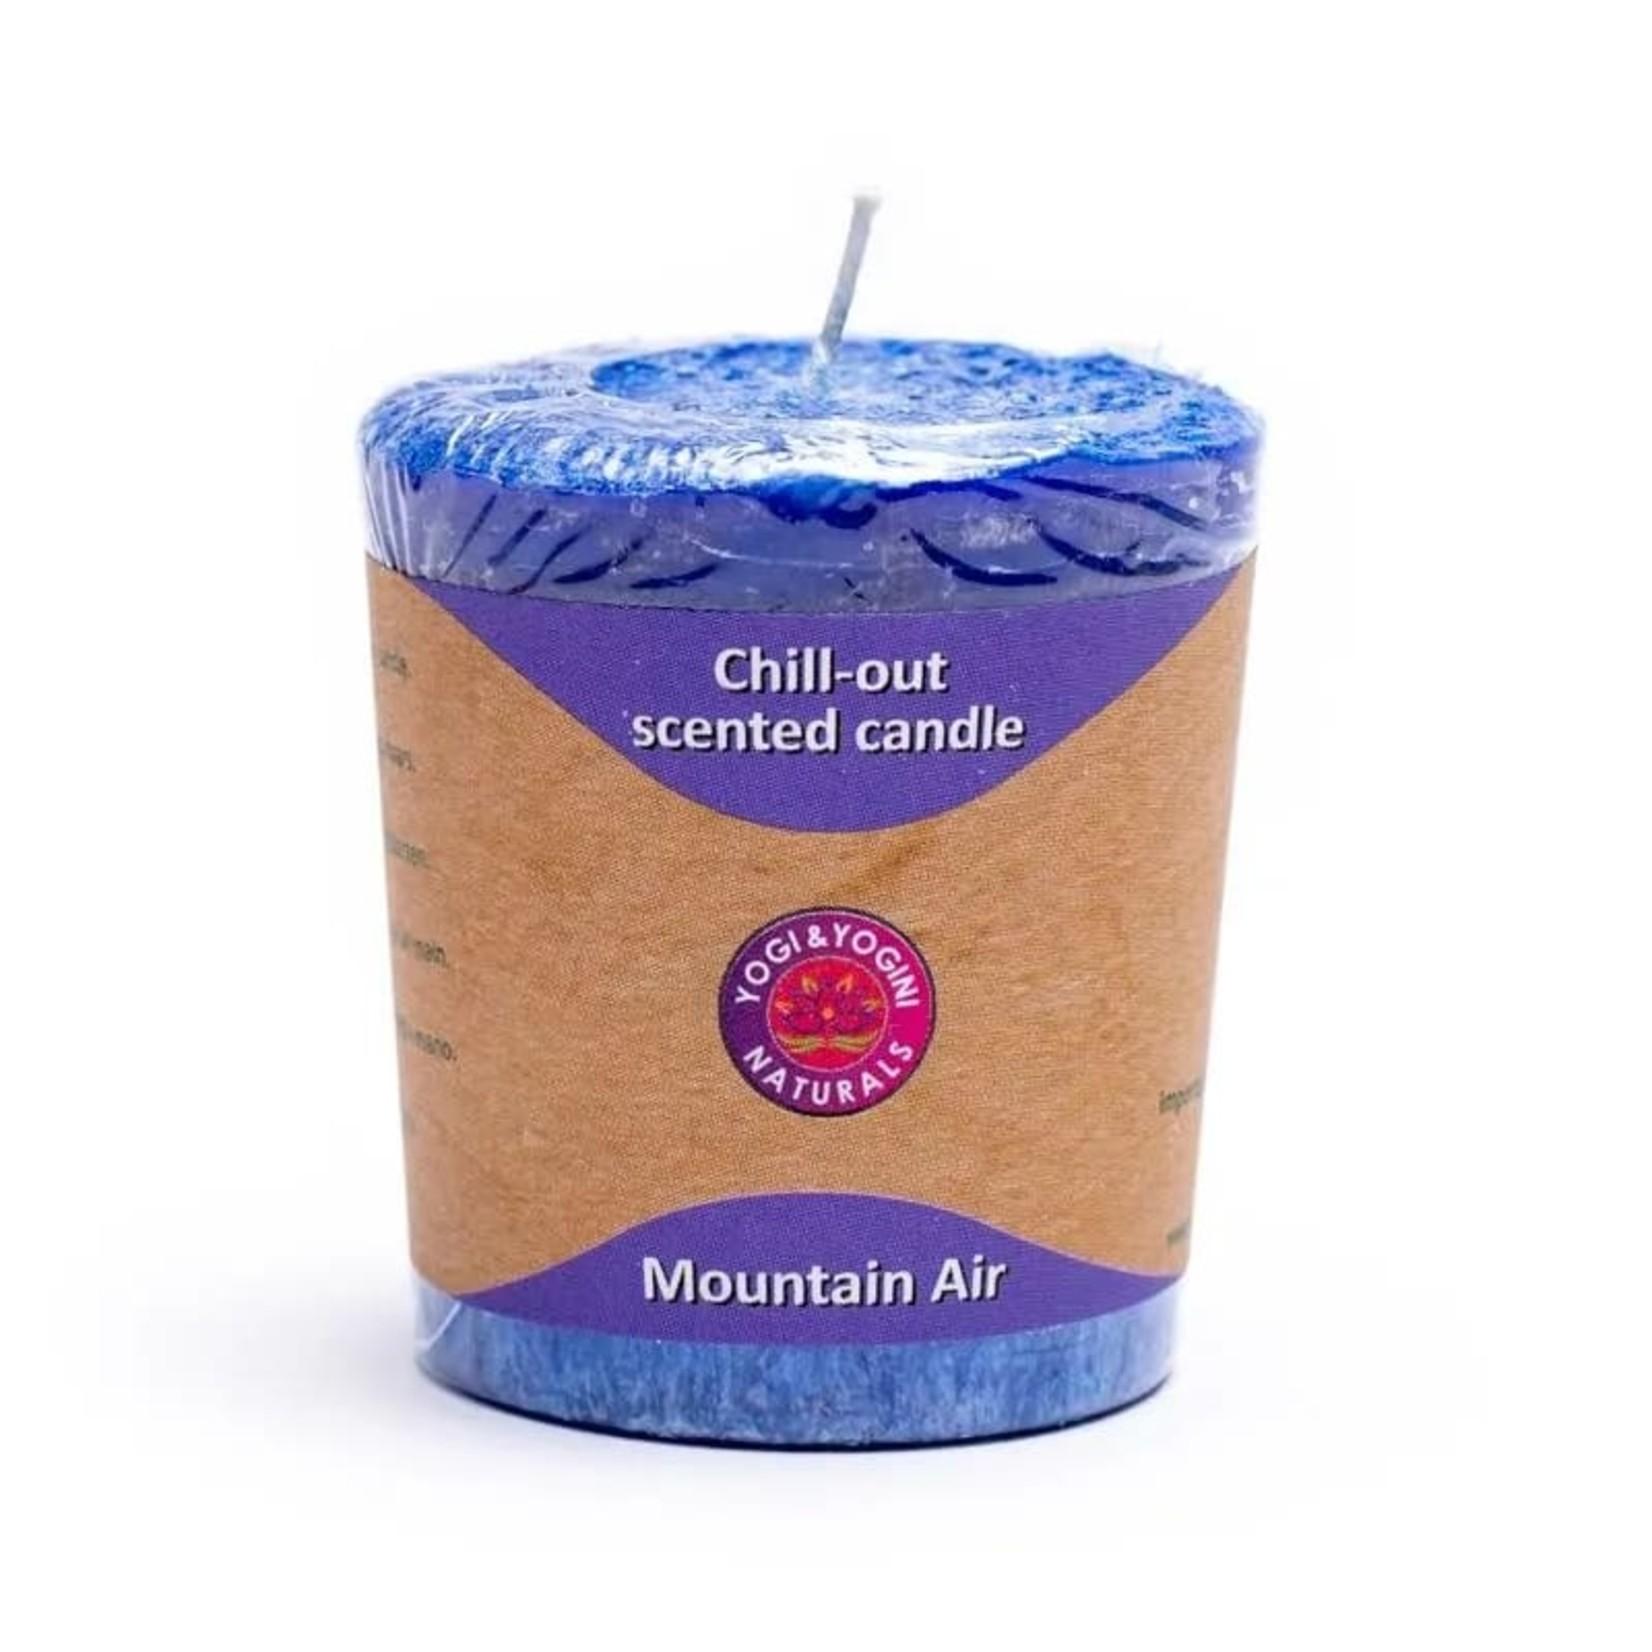 Yogi & yogini naturals Geurkaarsje Mountain Air met sandelhout, ceder en rozemarijn.